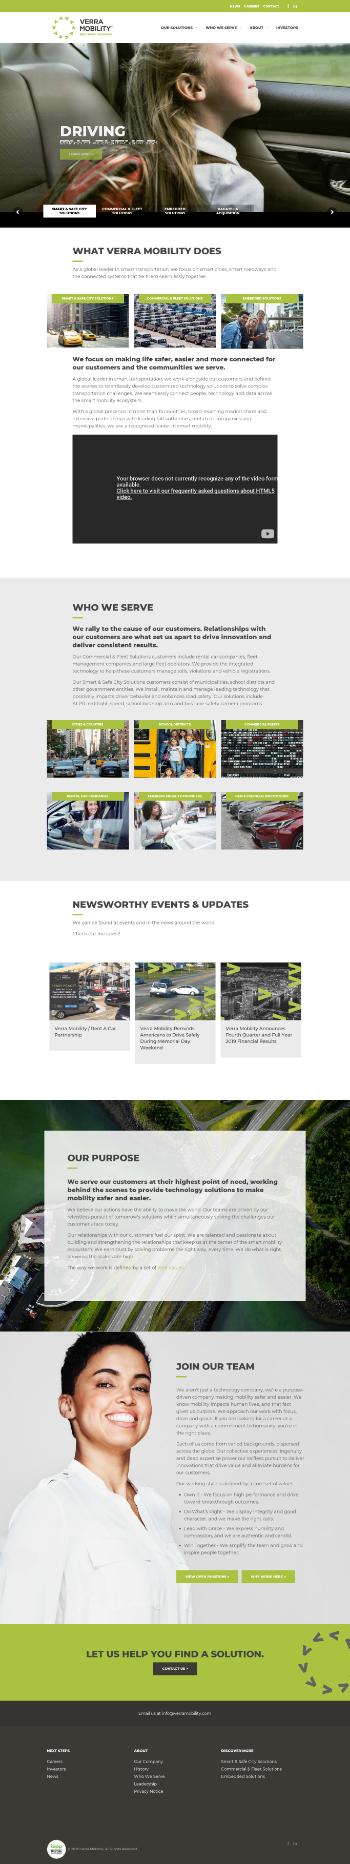 Verra Mobility Corporation Website Screenshot